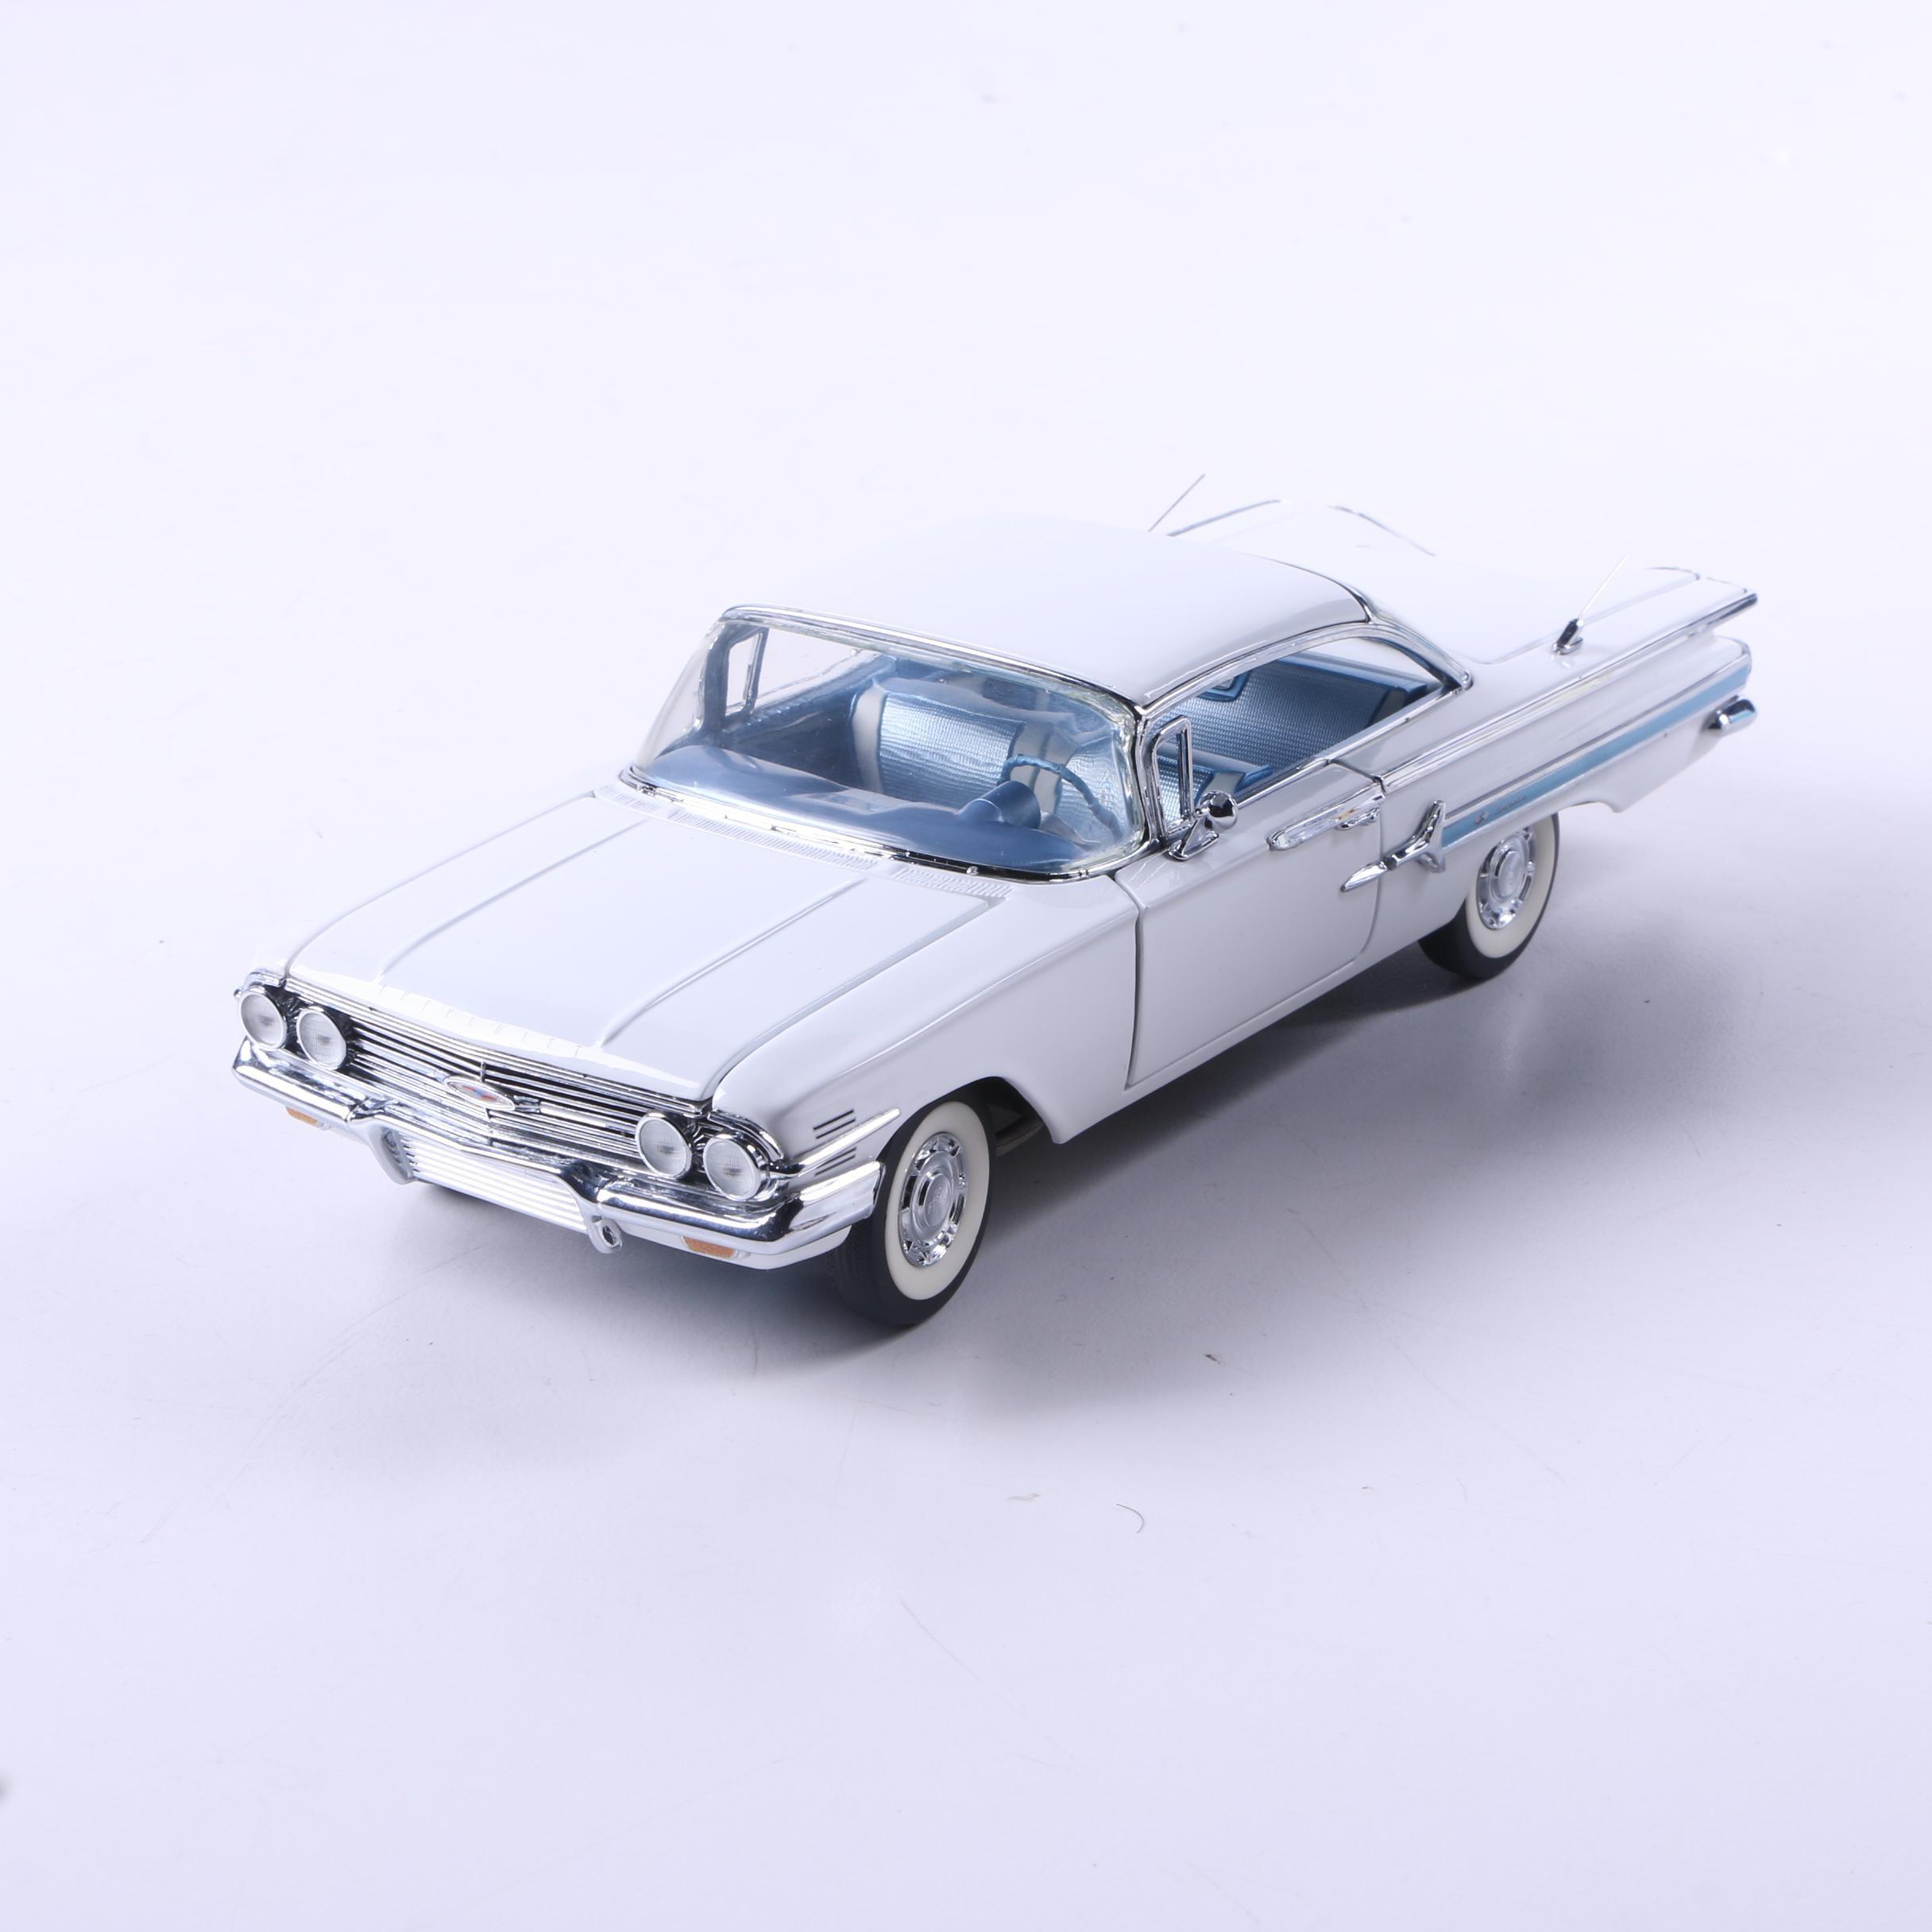 Franklin Mint 1960 Chevy Impala Die-Cast Car